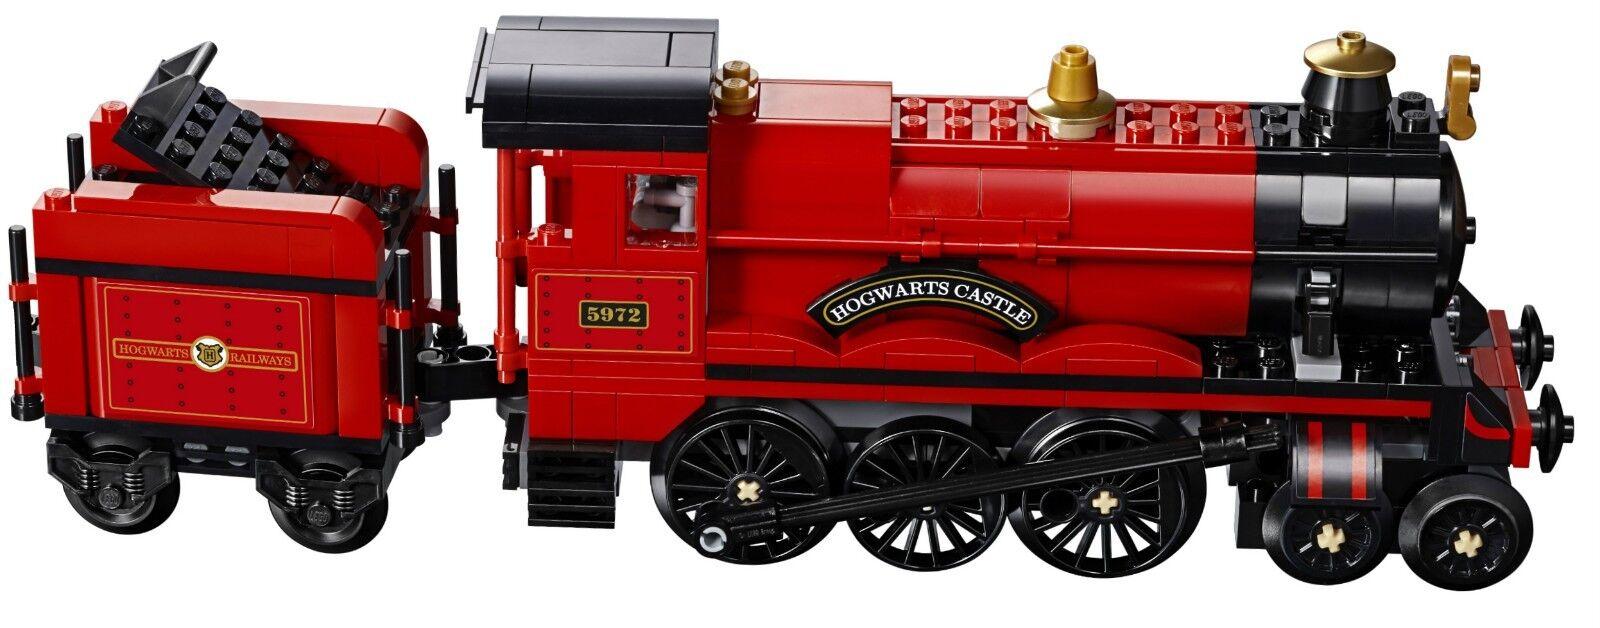 NEW LEGO HOGWART'S EXPRESS - TRAIN & TENDER ONLY 75955 partial harry potter set